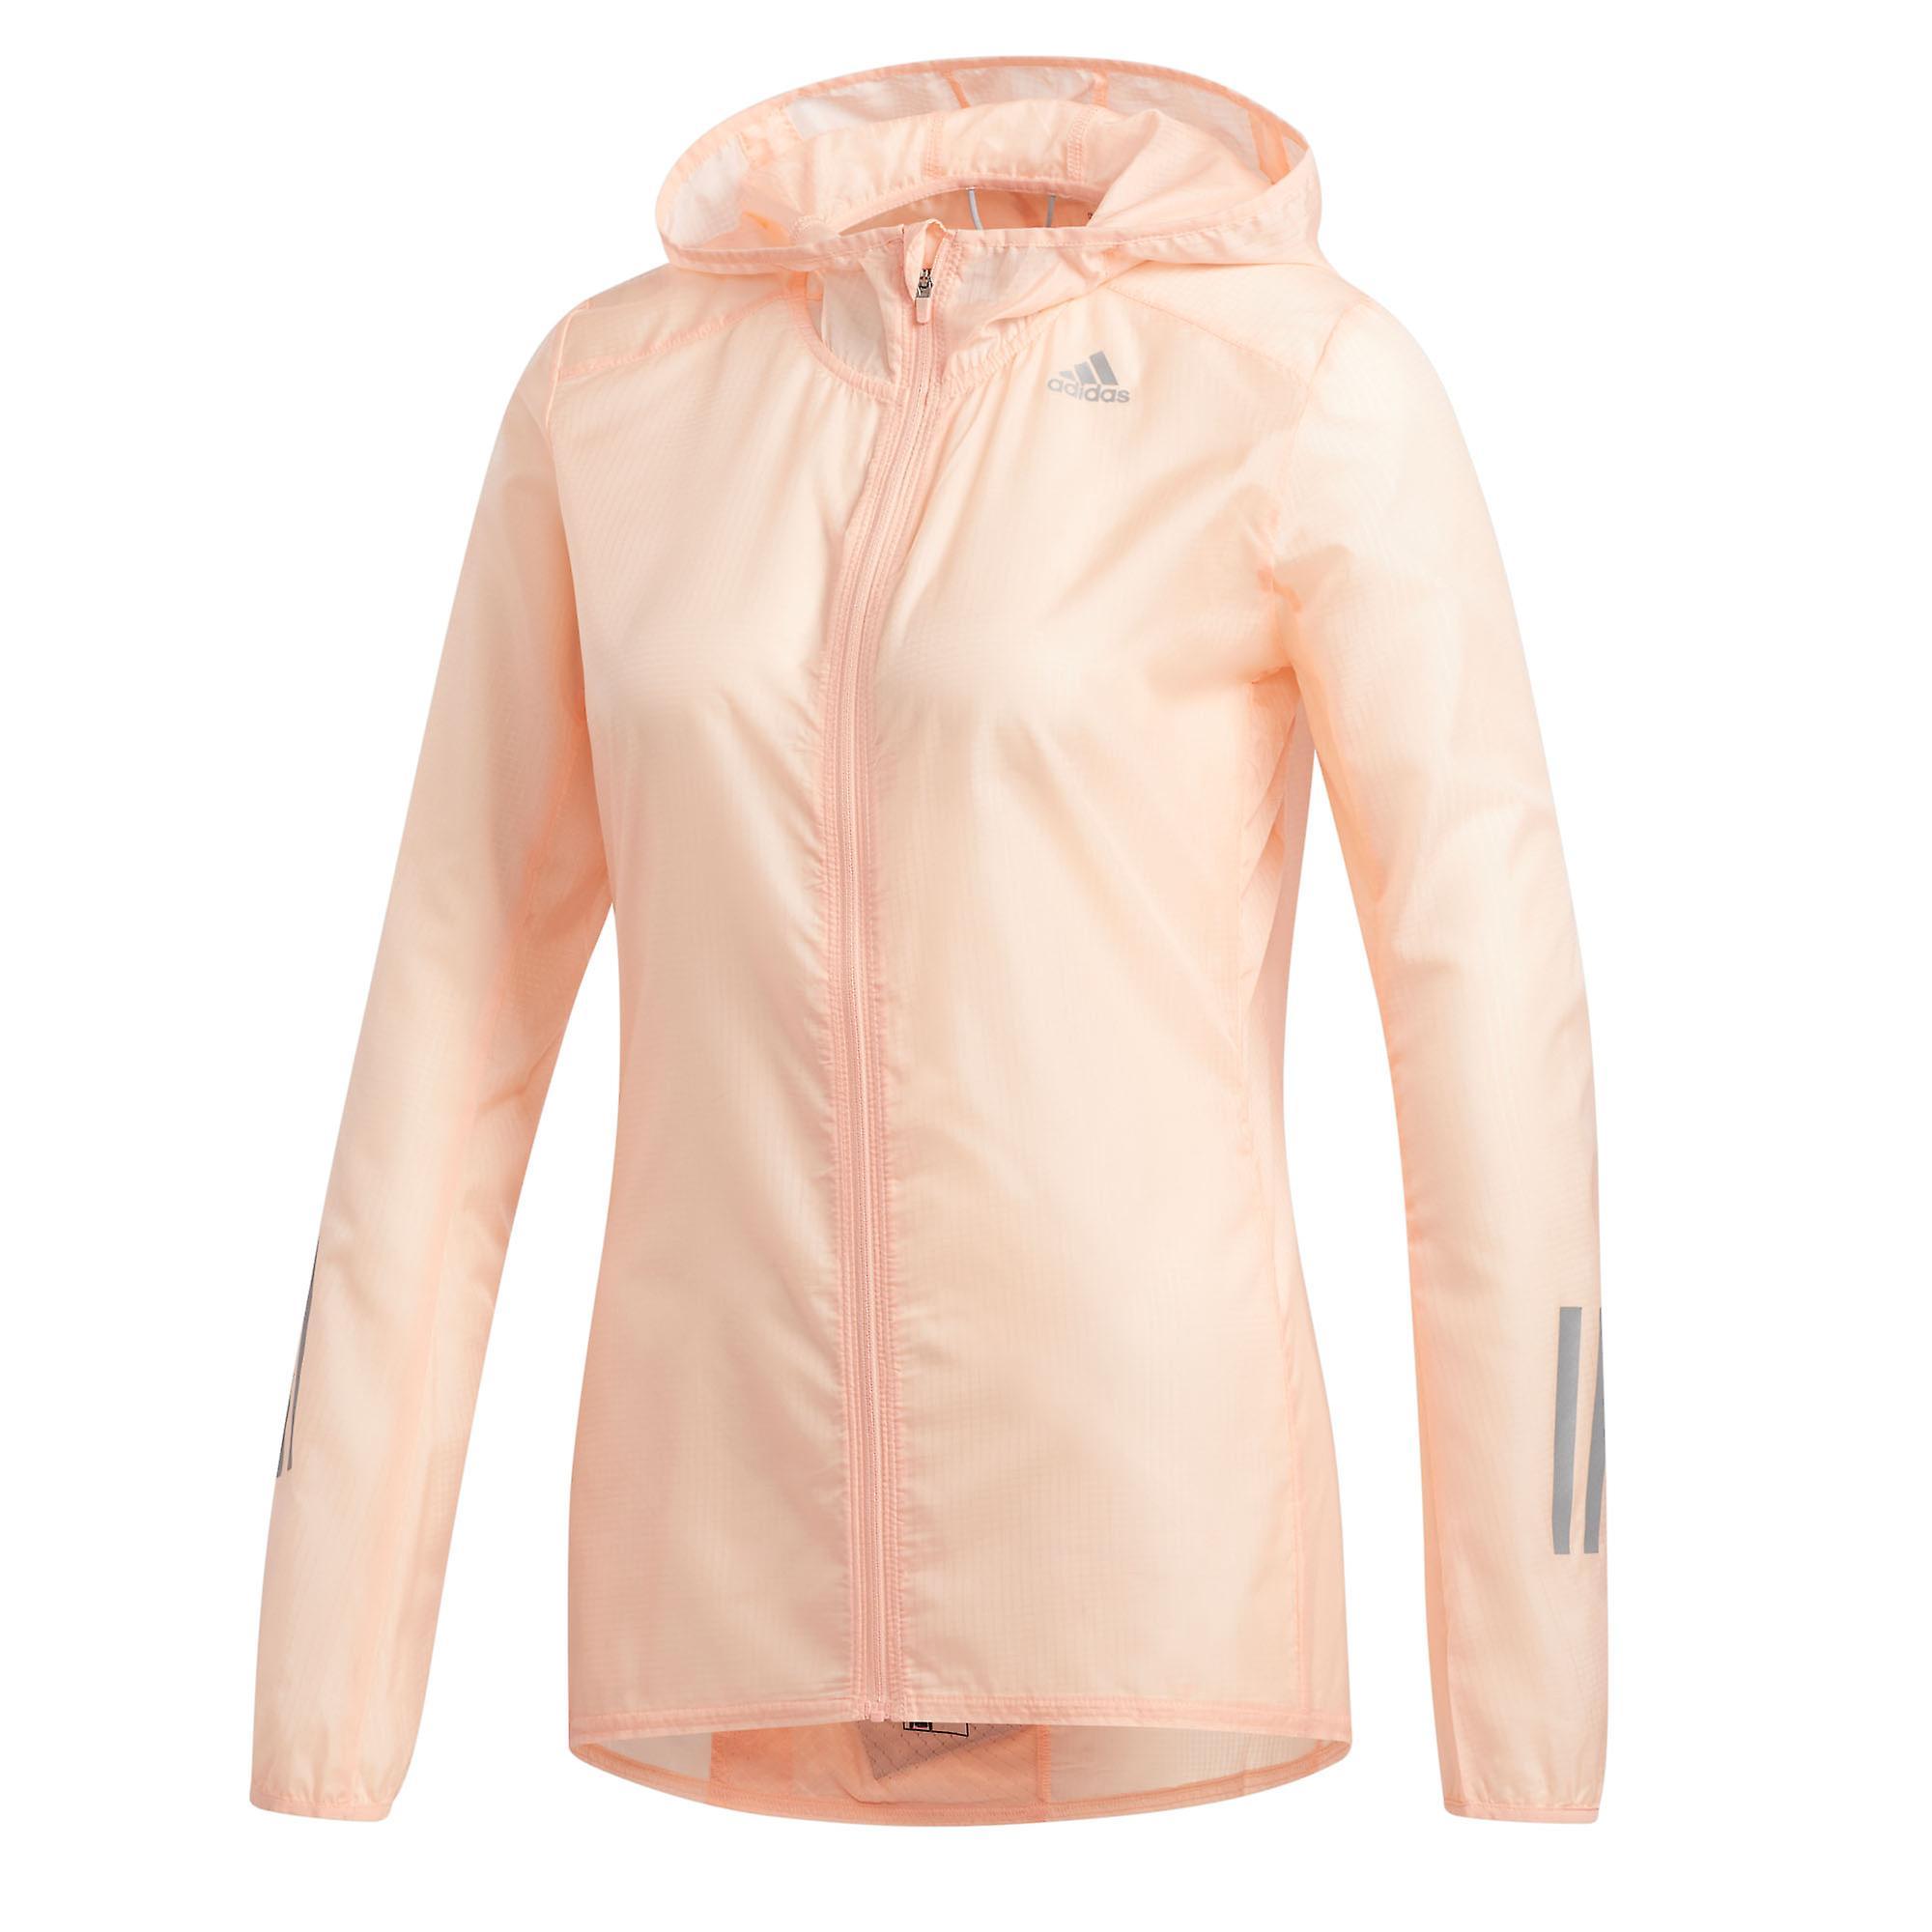 adidas Own The Run Womens Running Fitness Training Jacket Pink